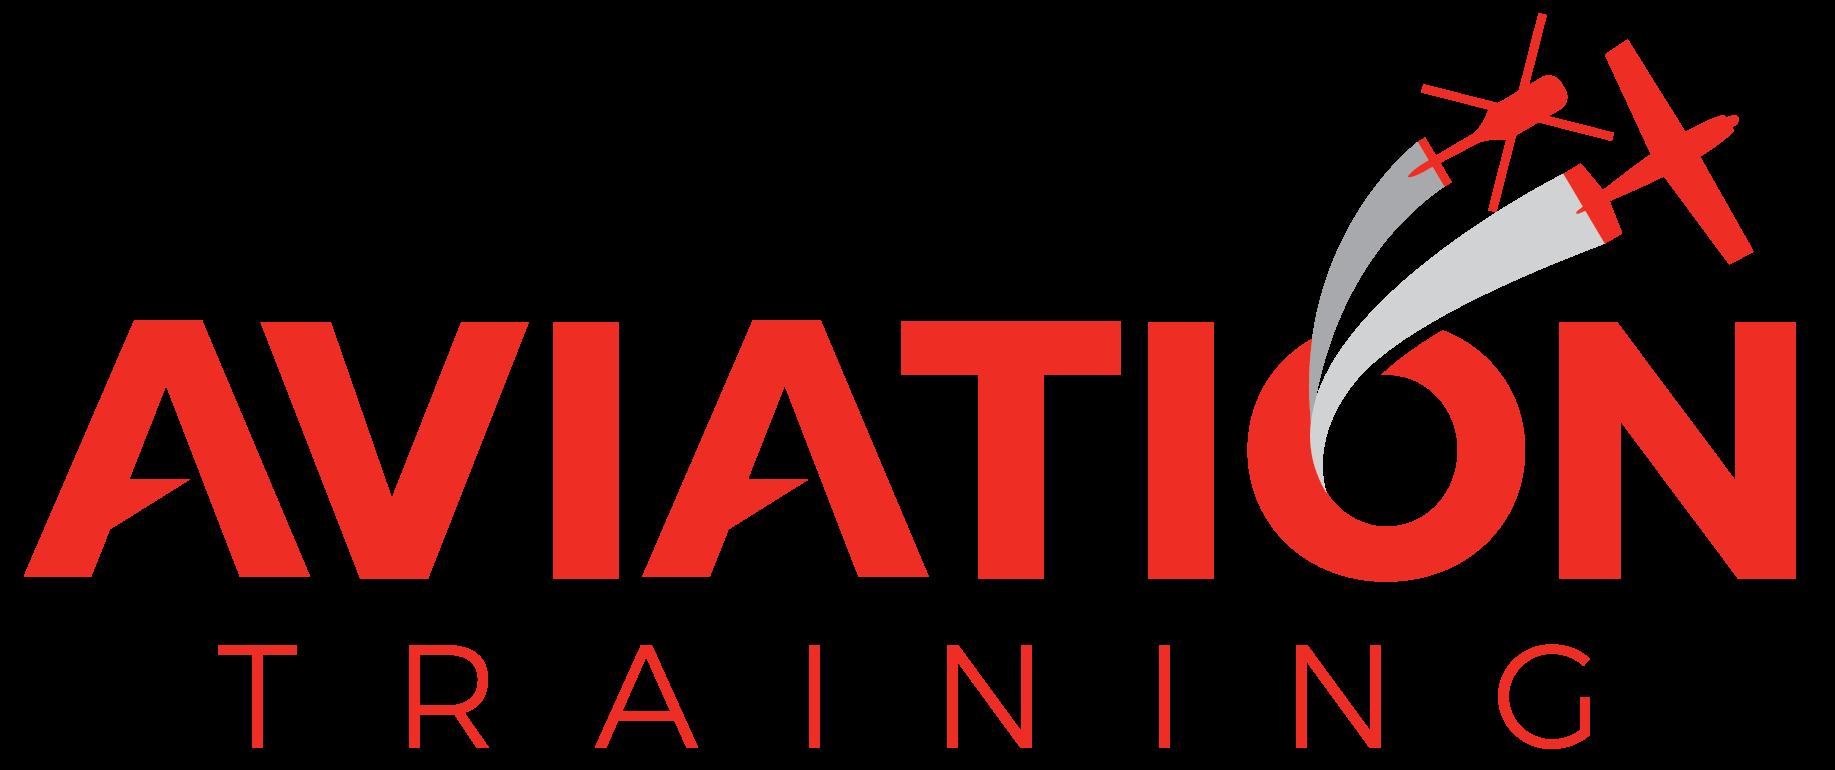 Aviation Training Limited